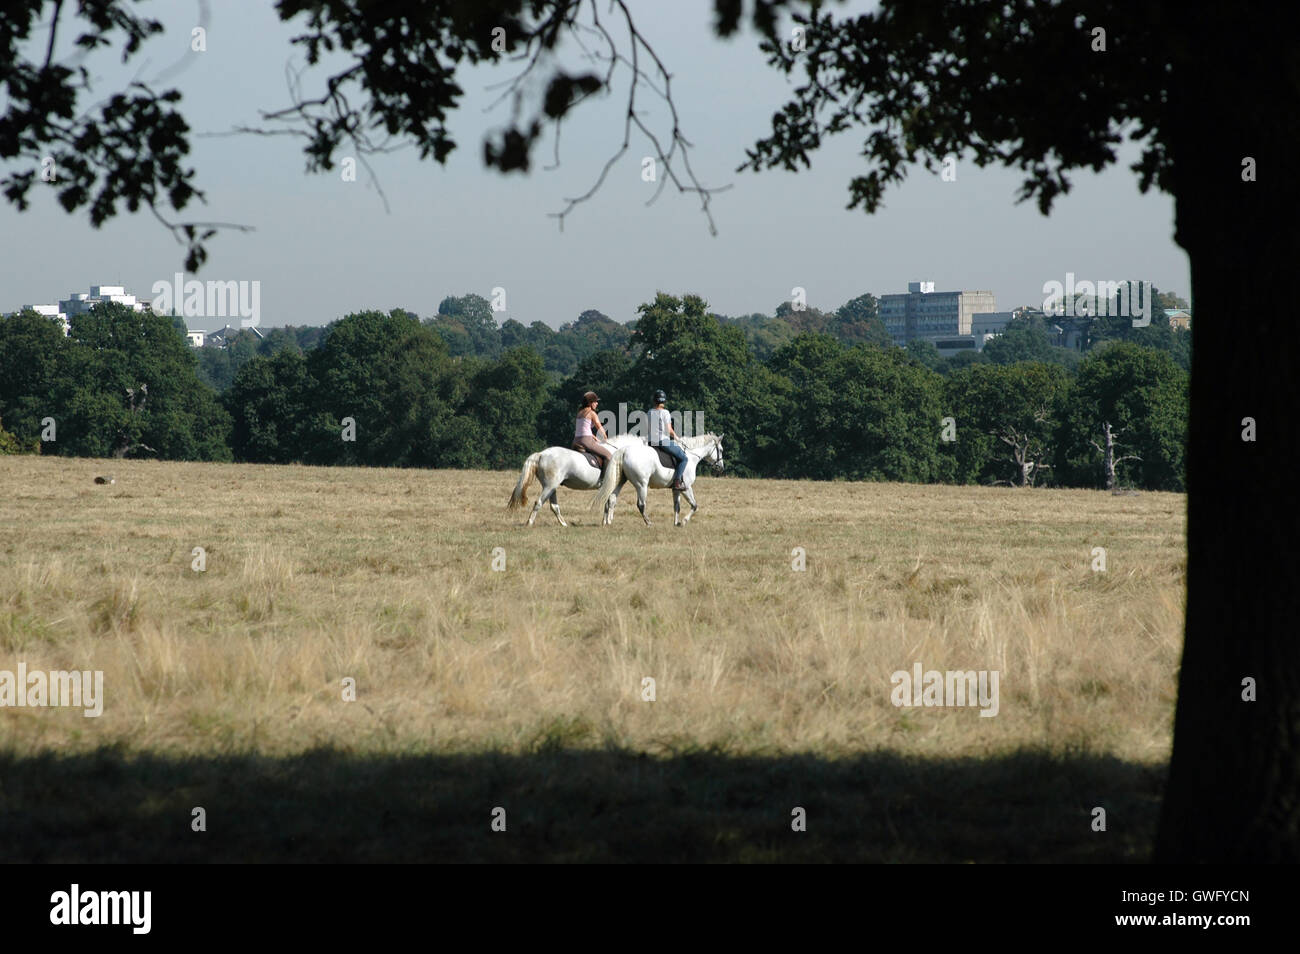 London, UK, 13. September 2016, Reiter im Richmond Park am heißesten Tag im September bei Celsius 32 Grad in London Stockfoto